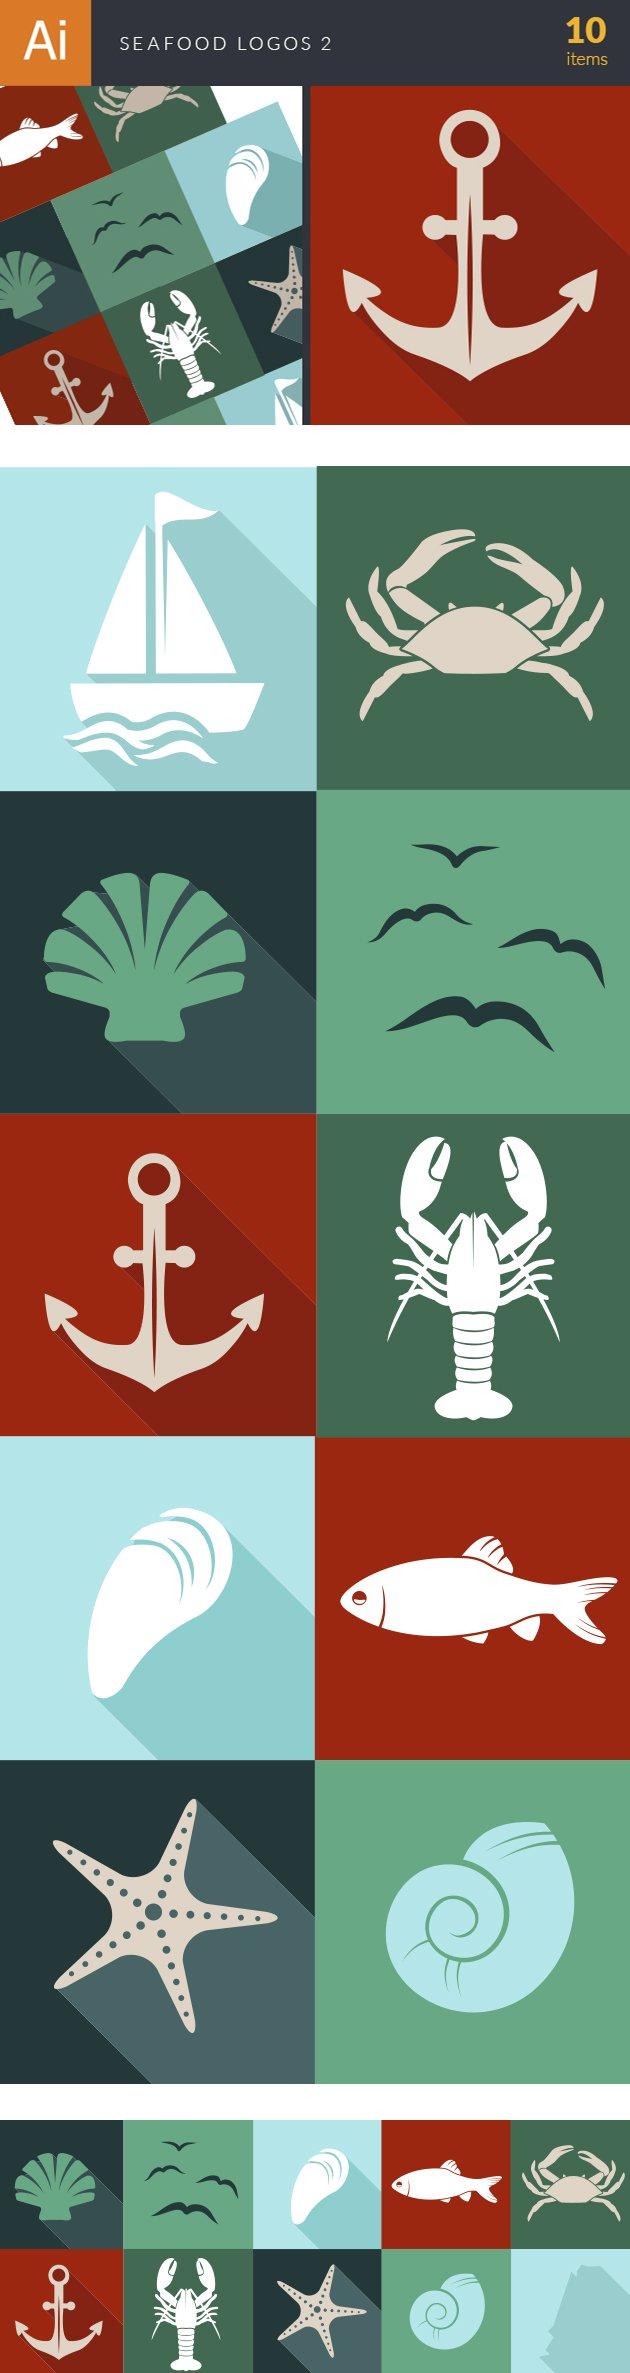 Seafood Logos Vector 2 designtnt seadfood logos vector 2 vector large